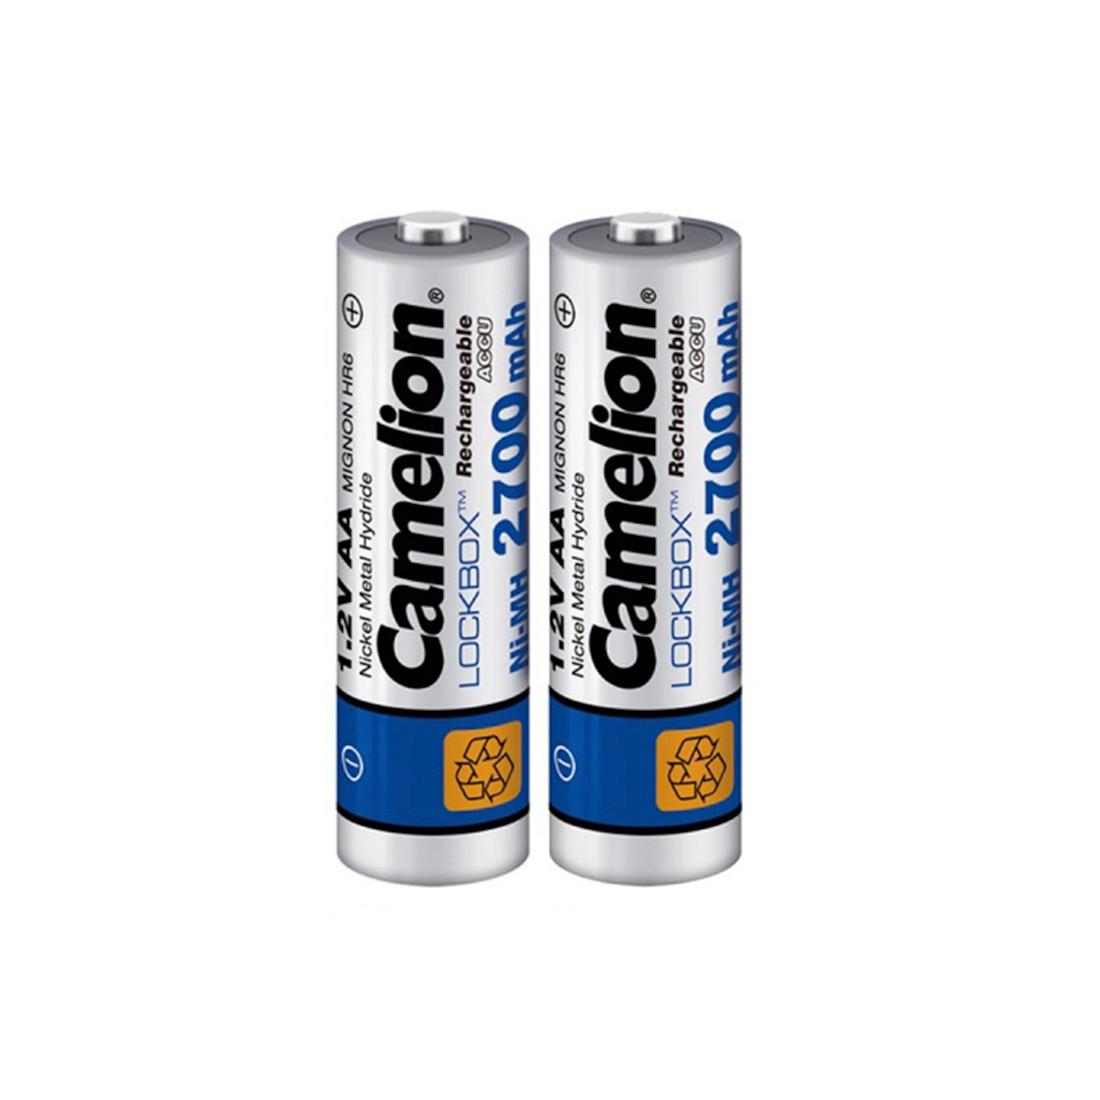 CAMELION, Lockbox Rechargeable, Ni-MH, NH-AA2700LBP2, 2700 мА/ч, (2 шт.), аккумулятор